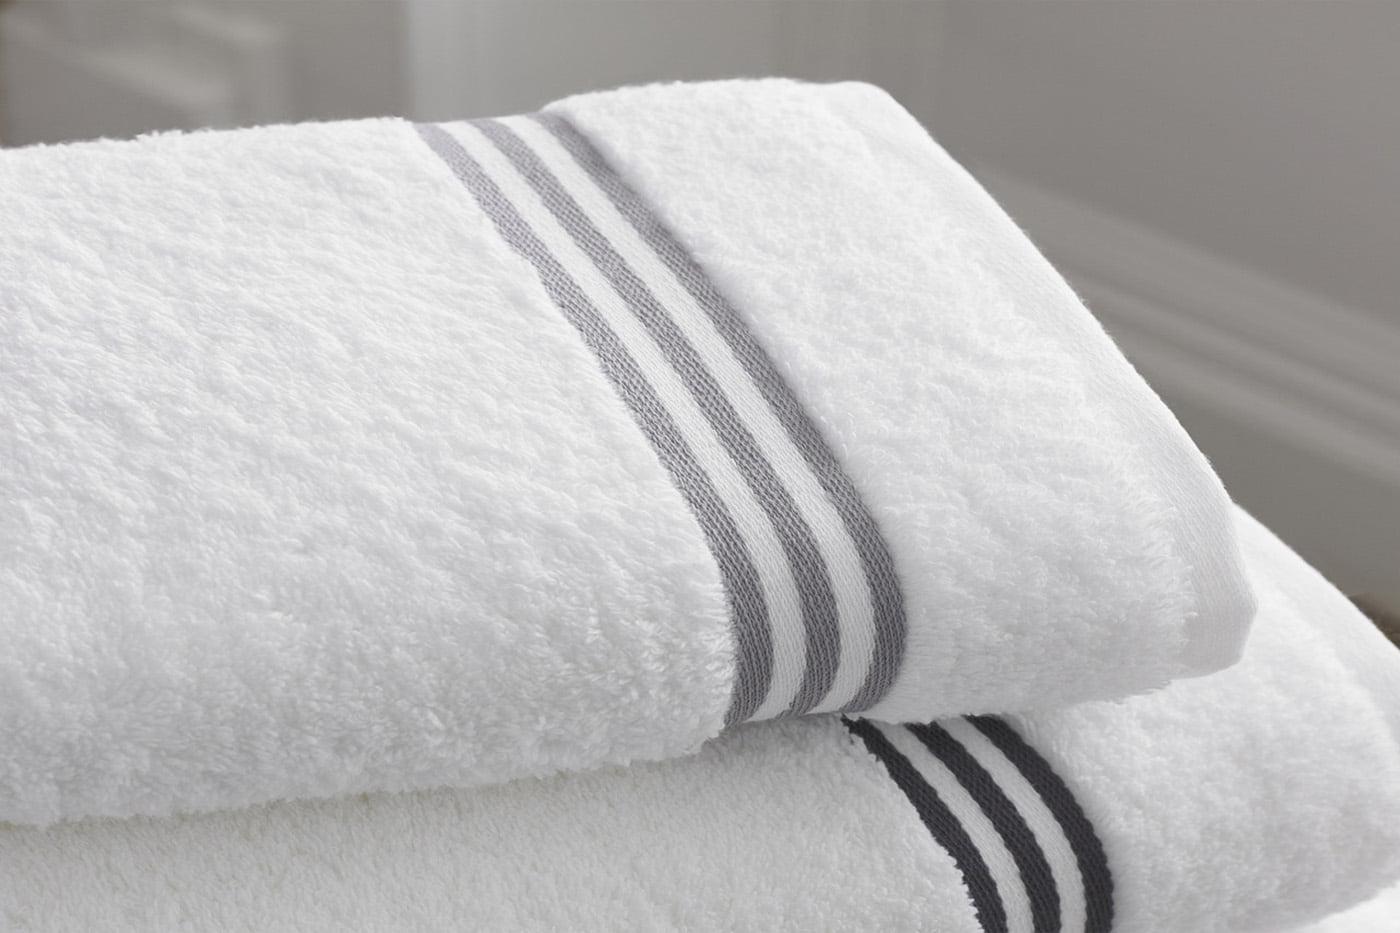 How Often Should You Wash Towels, Sheets & Pyjamas?